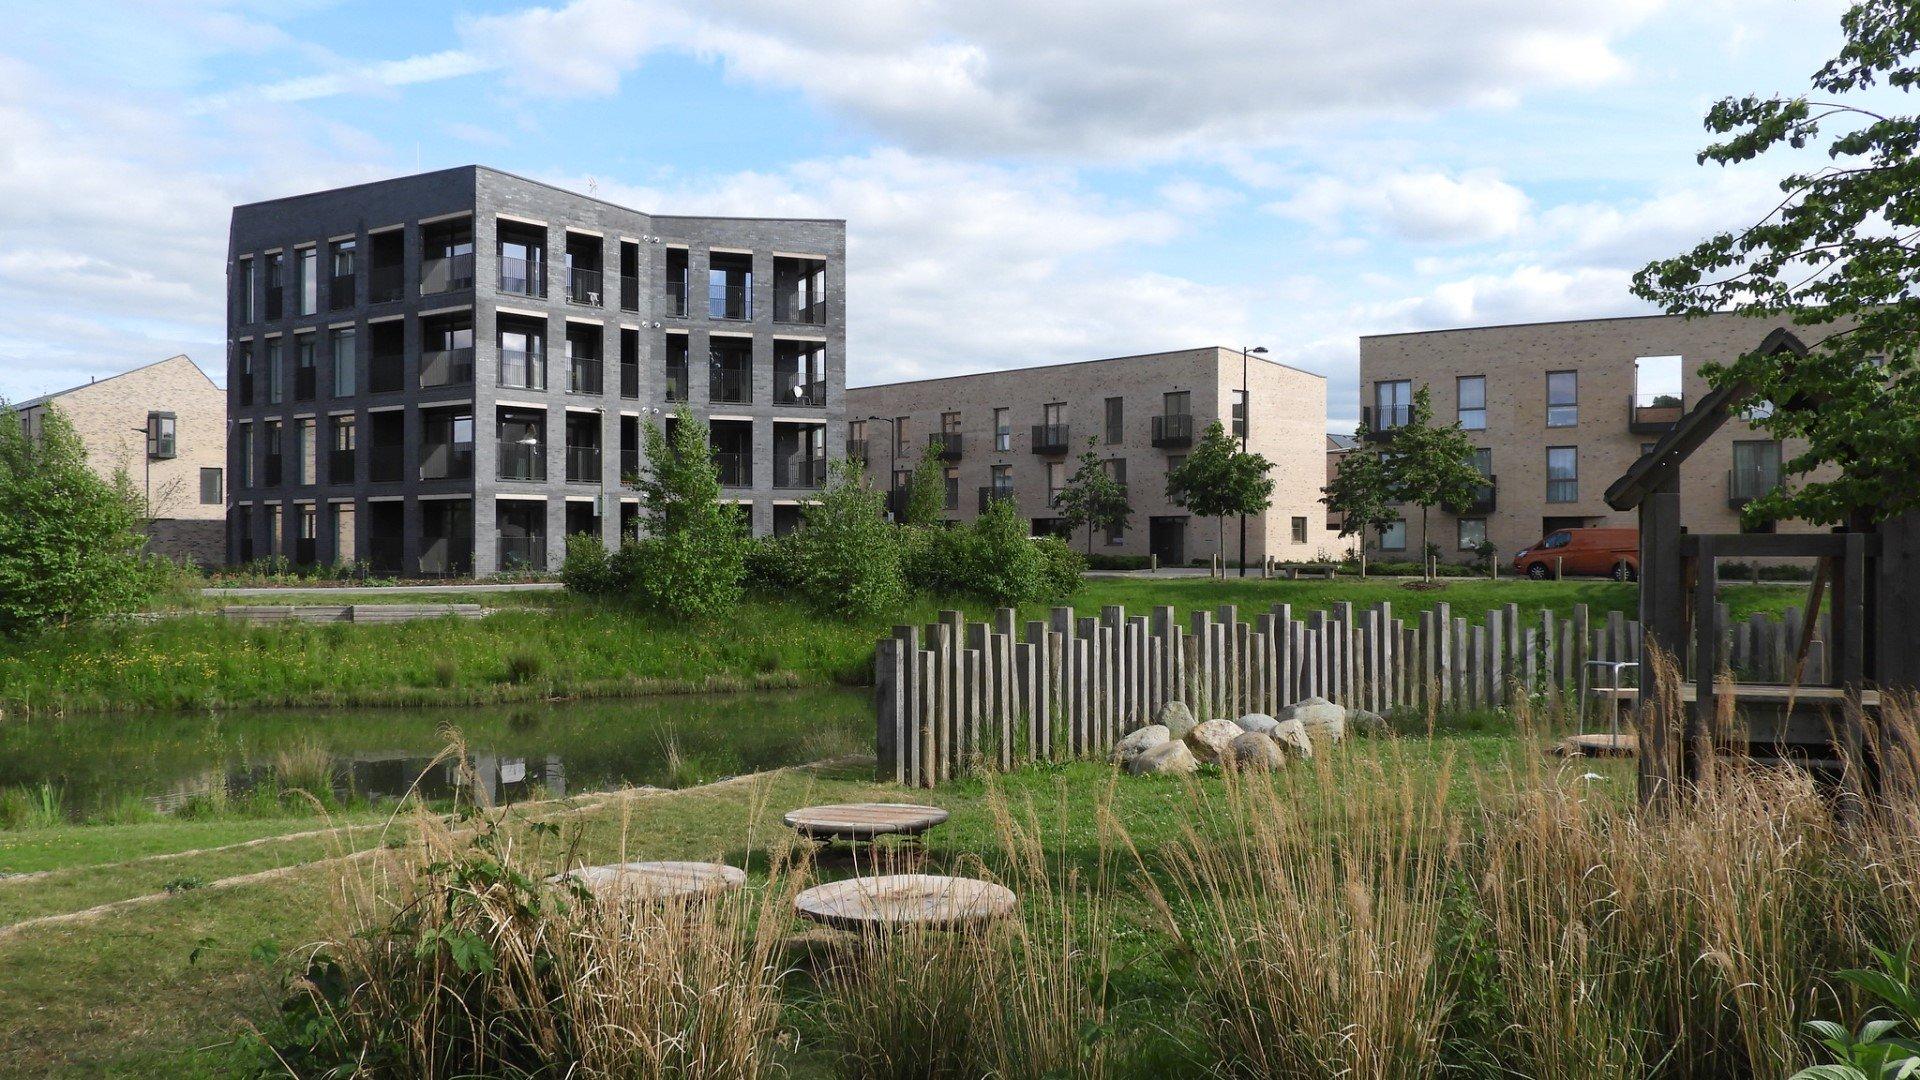 Oxford City Council selects third housebuilding partner at Barton Park. Image: Barton Park in Oxford